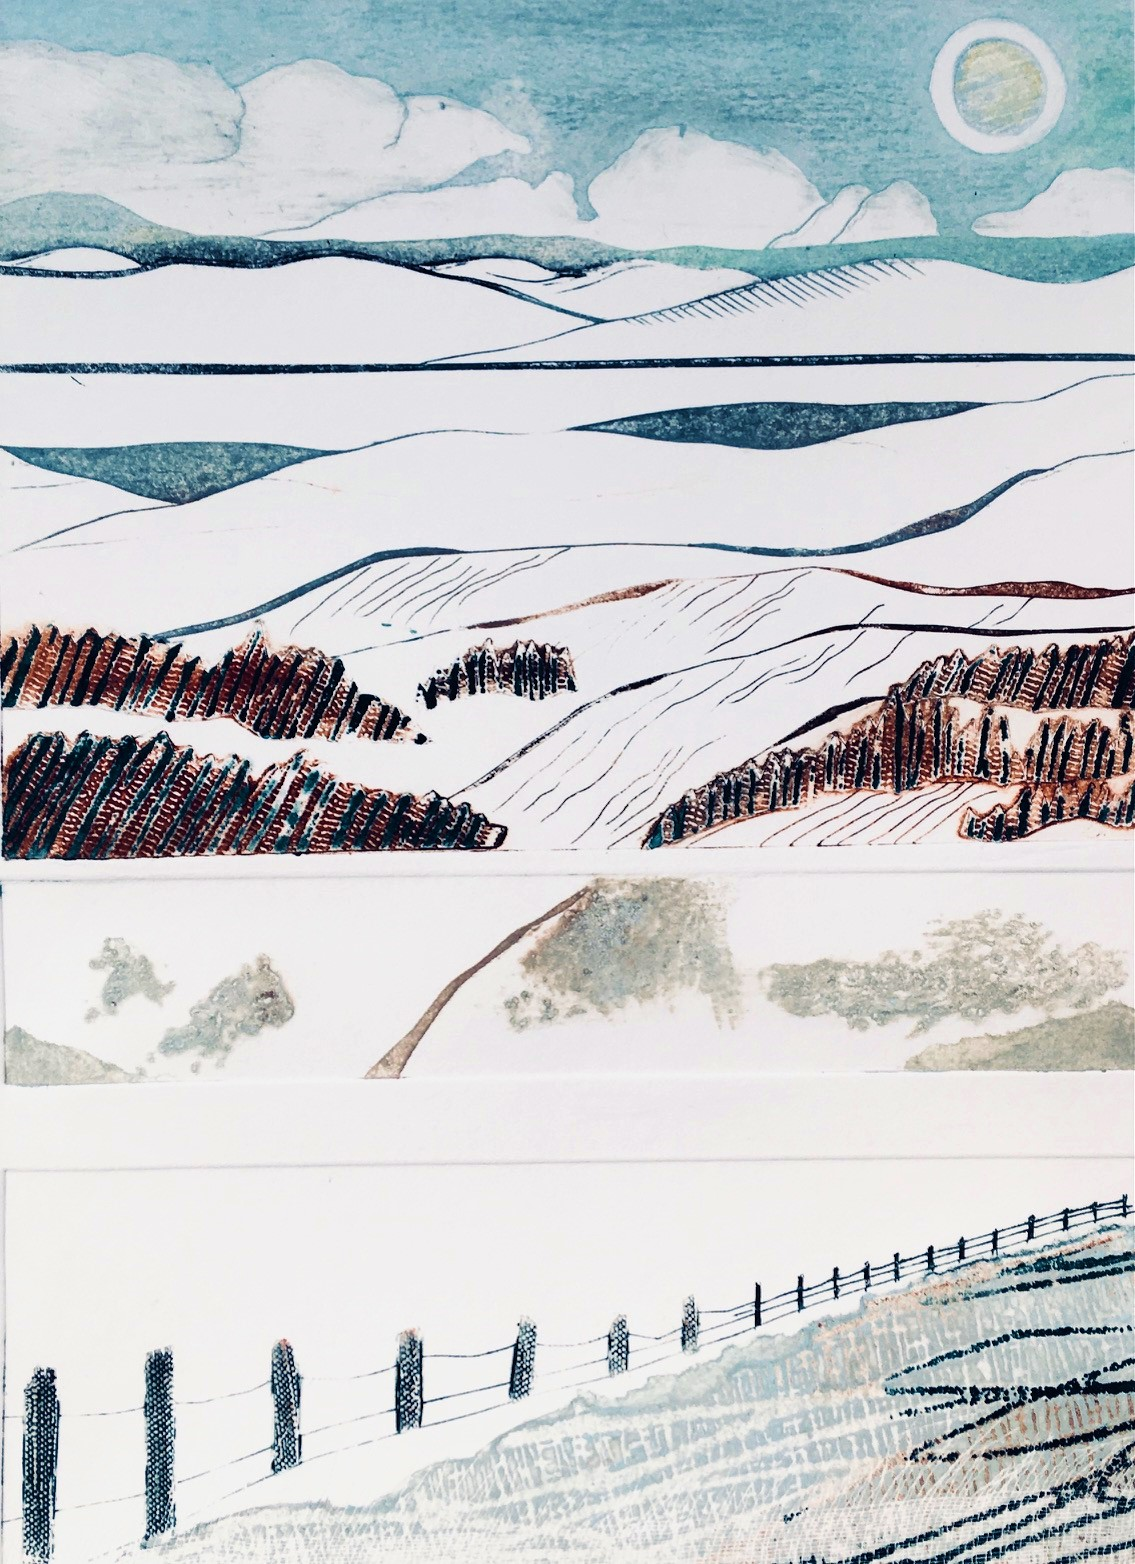 Gill Thompson. Whitescape - collagraph print